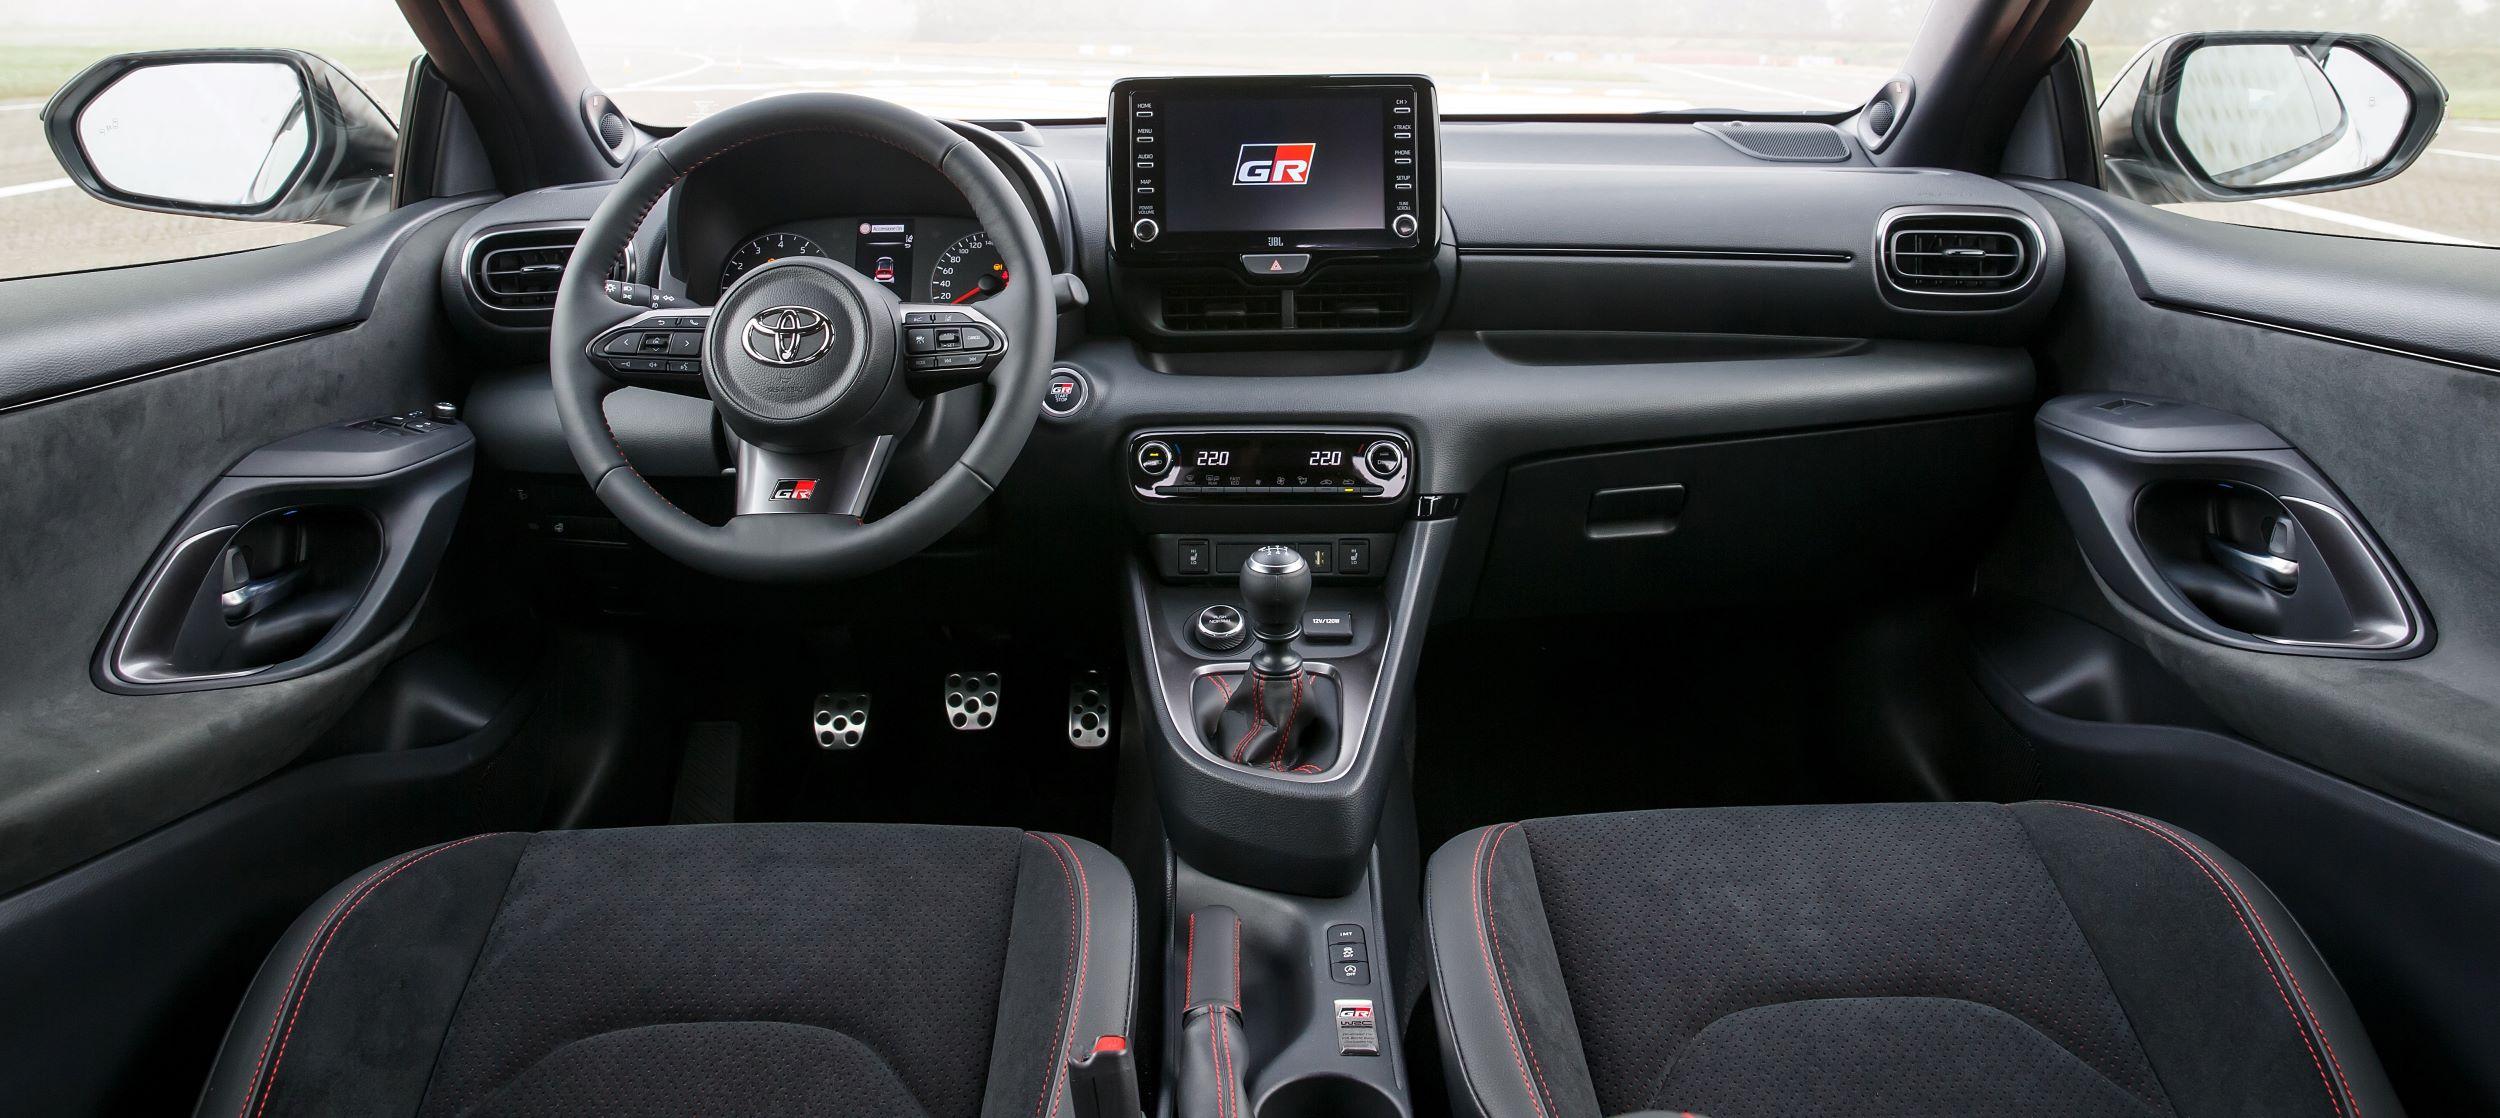 Toyota GR Yaris deska